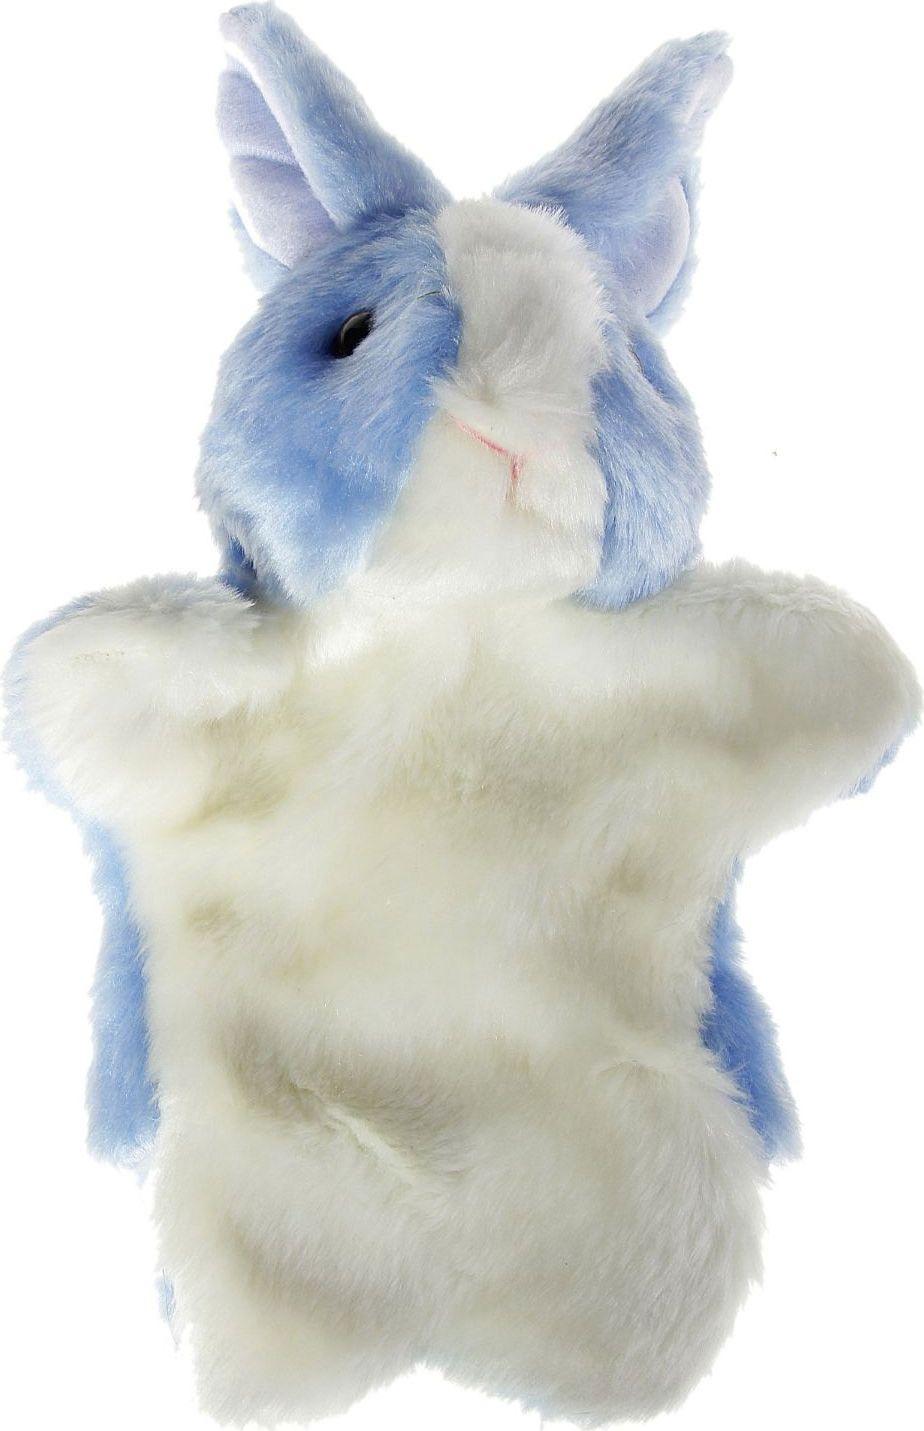 Sima-land Мягкая игрушка на руку Заяц цвет голубой, белый sima land мягкая игрушка на руку мальчик 1147835